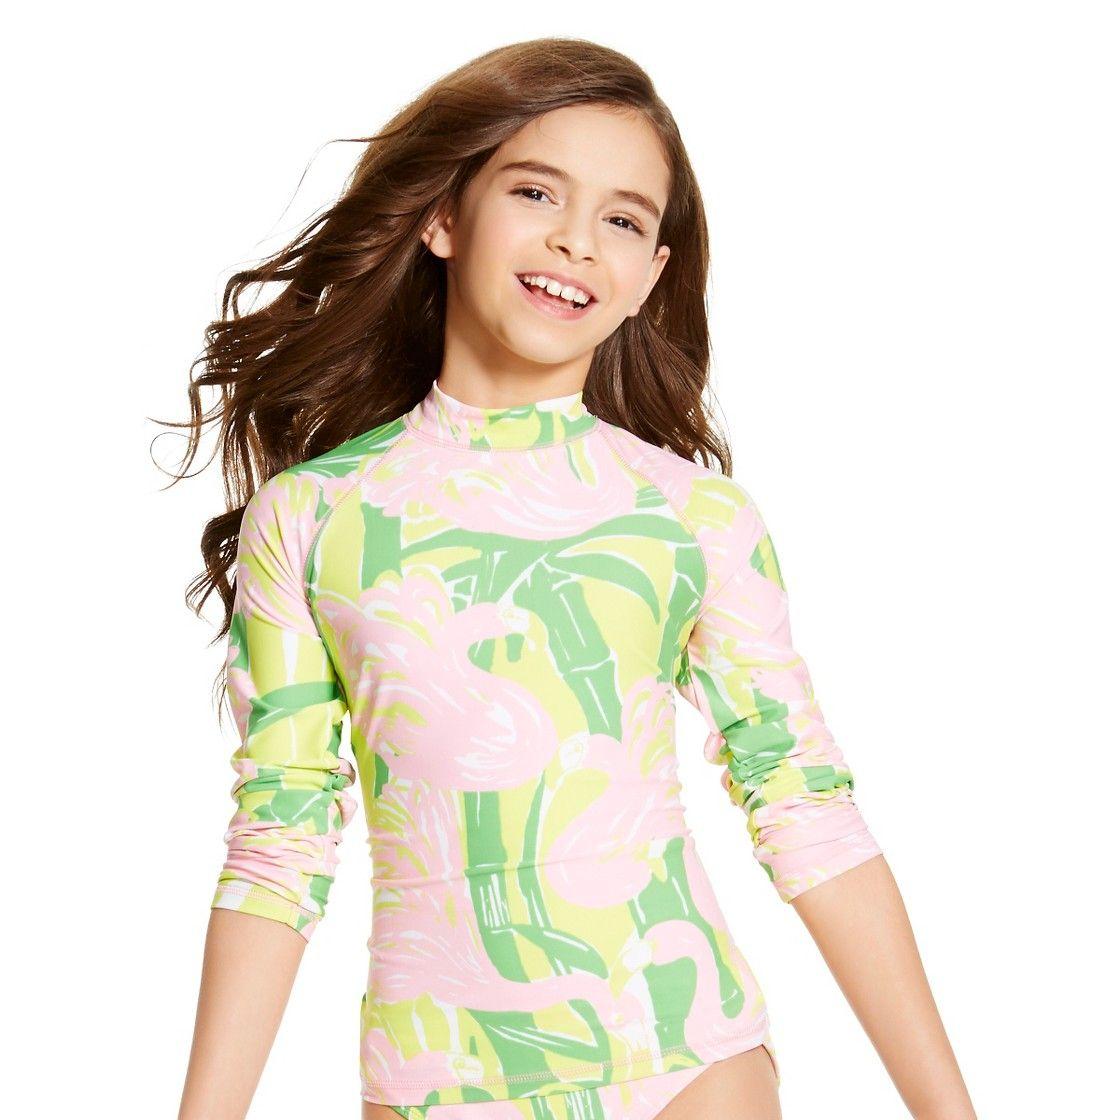 Lilly Pulitzer for Target Girls' Rashguard Fan Dance